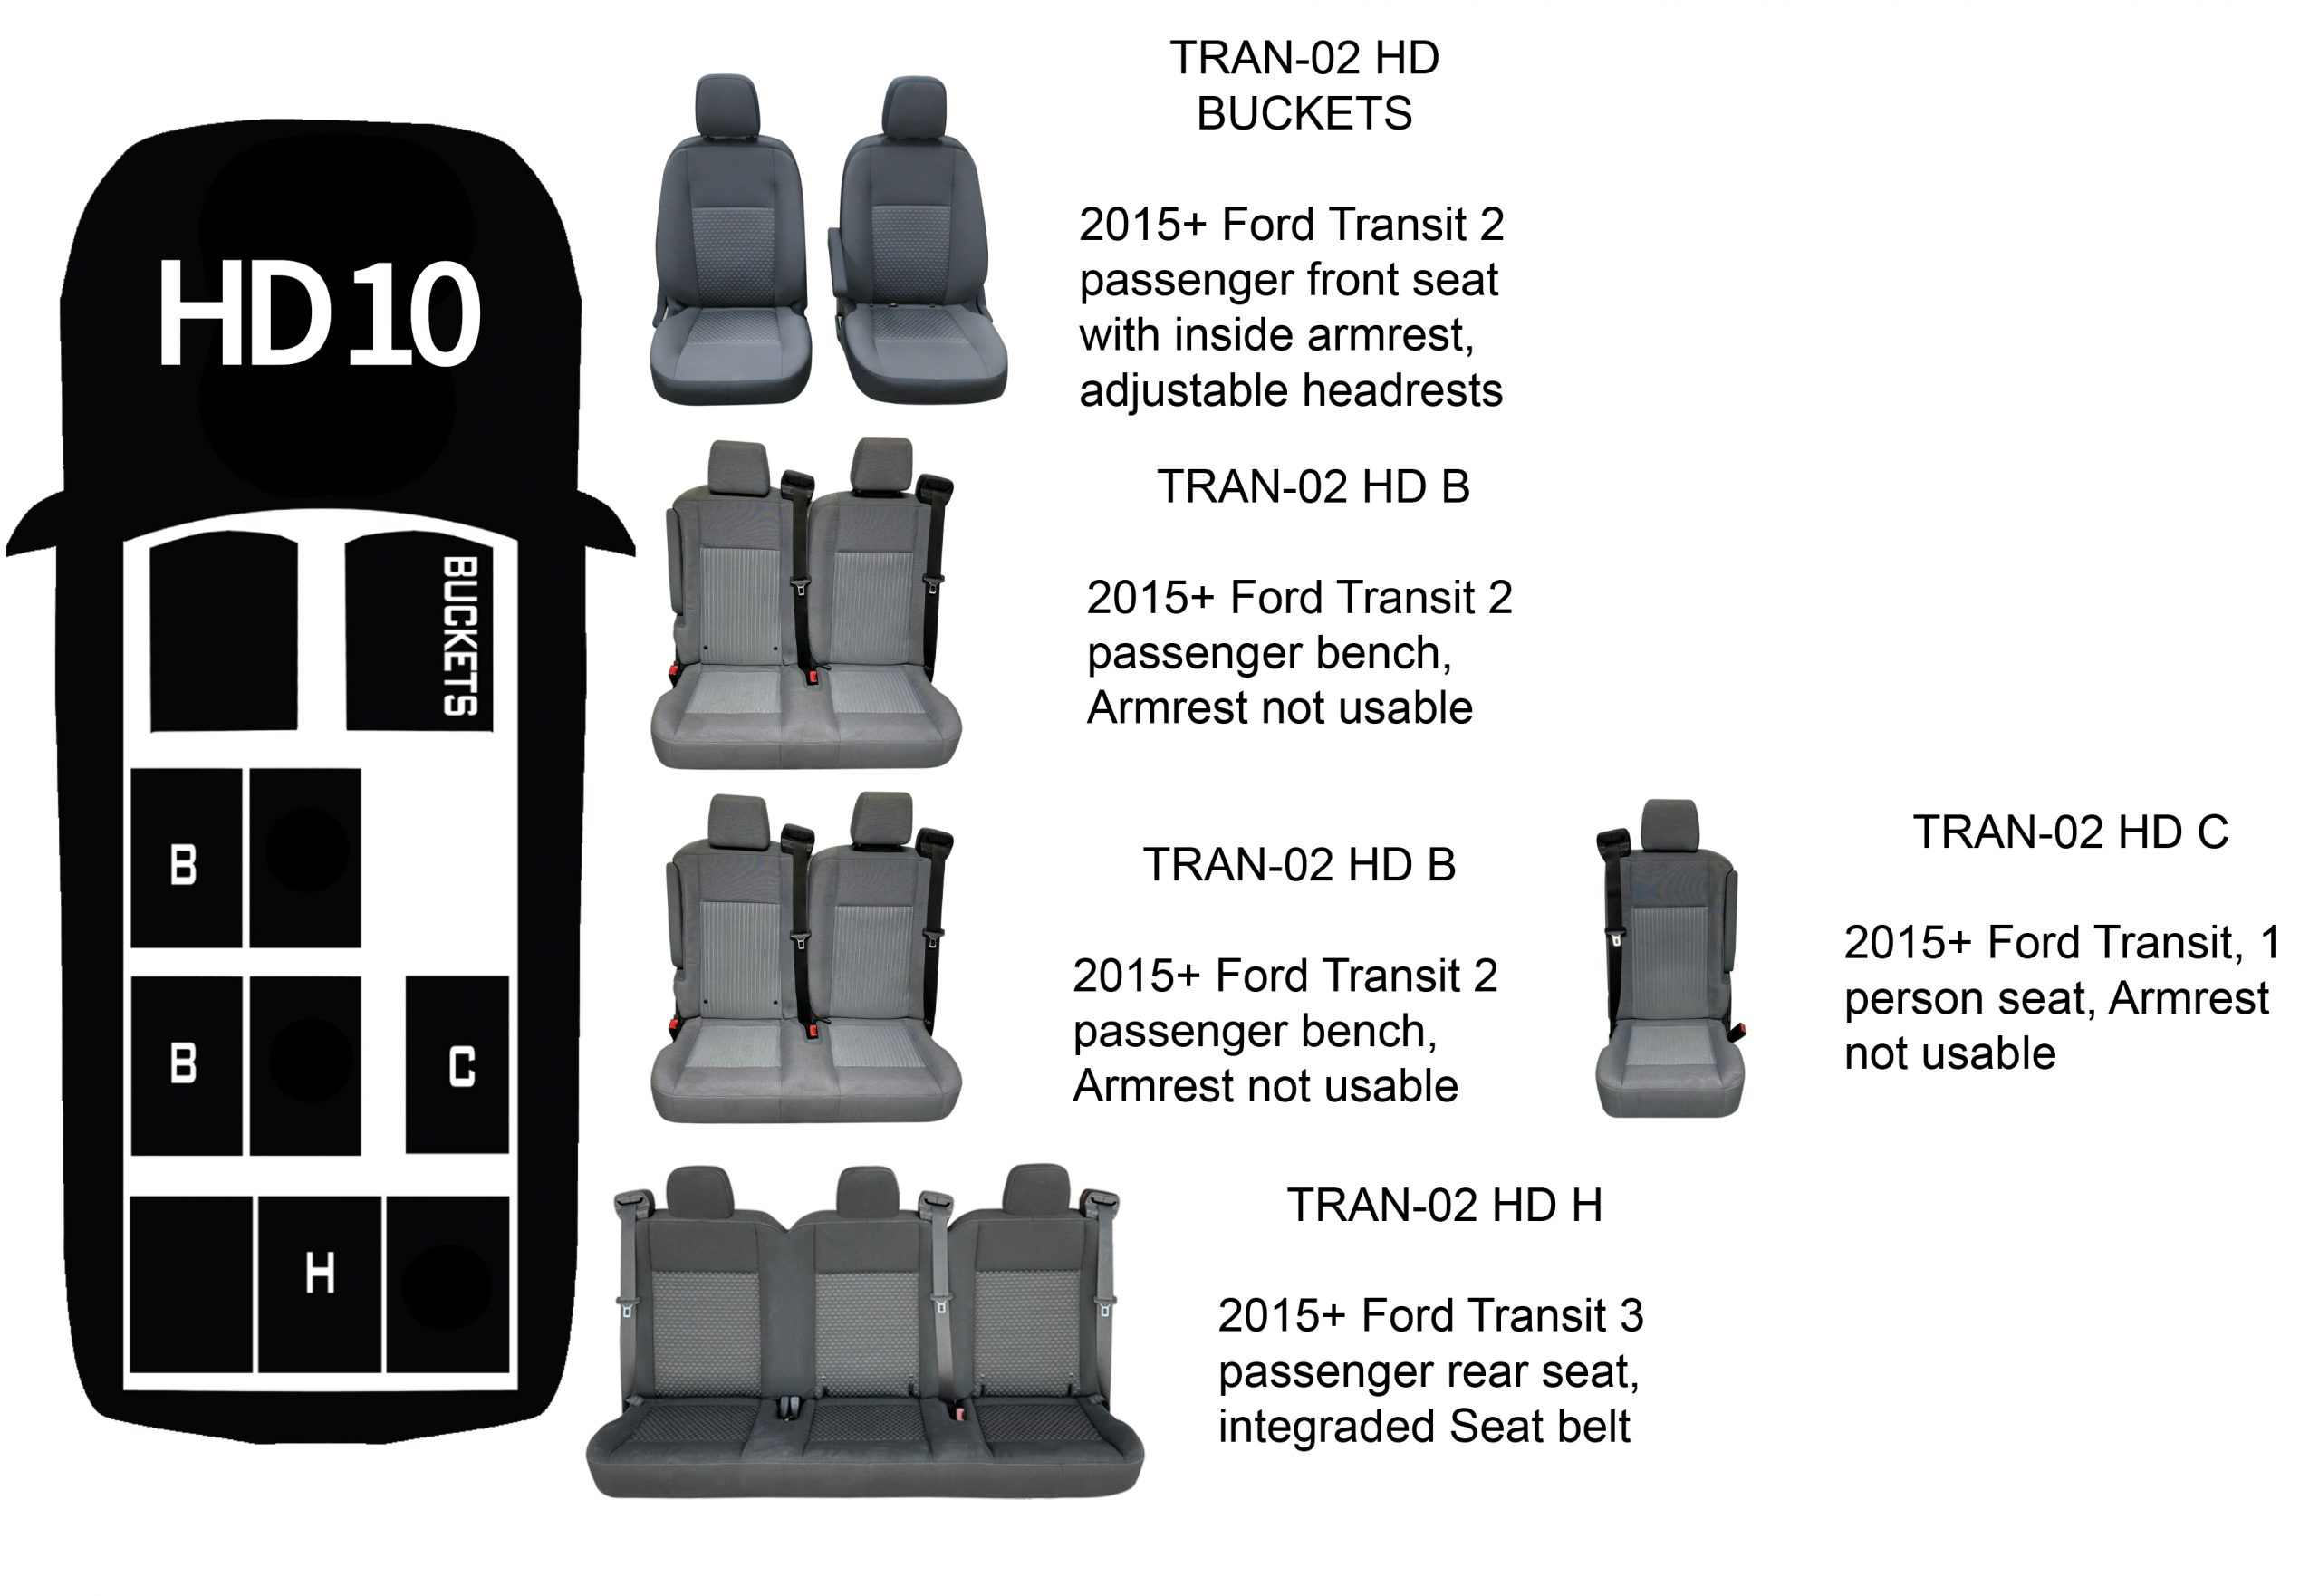 HD-10